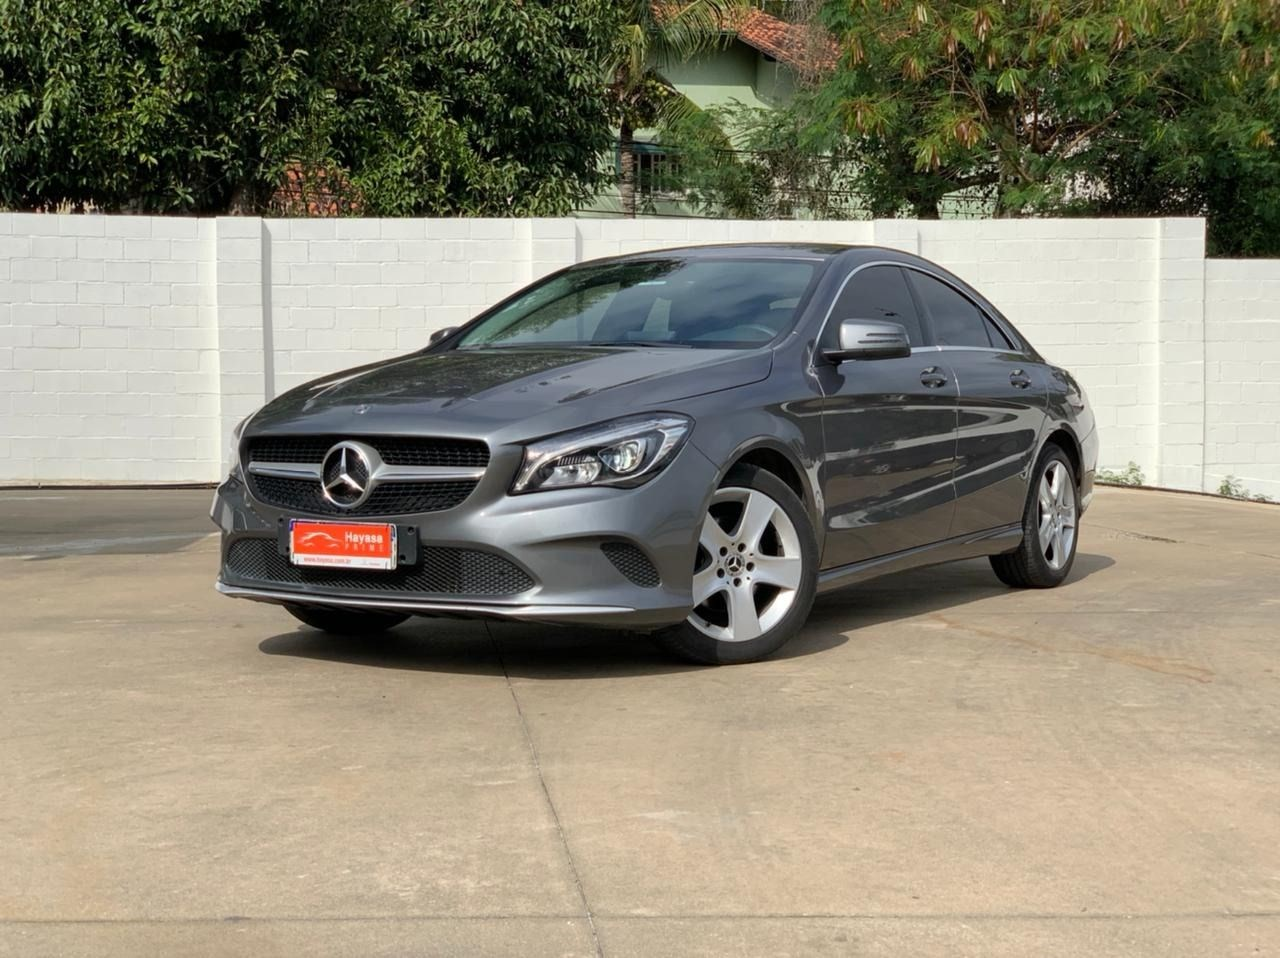 //www.autoline.com.br/carro/mercedes-benz/c-180-16-coupe-avantgarde-16v-gasolina-2p-turbo-aut/2018/niteroi-rj/15066466